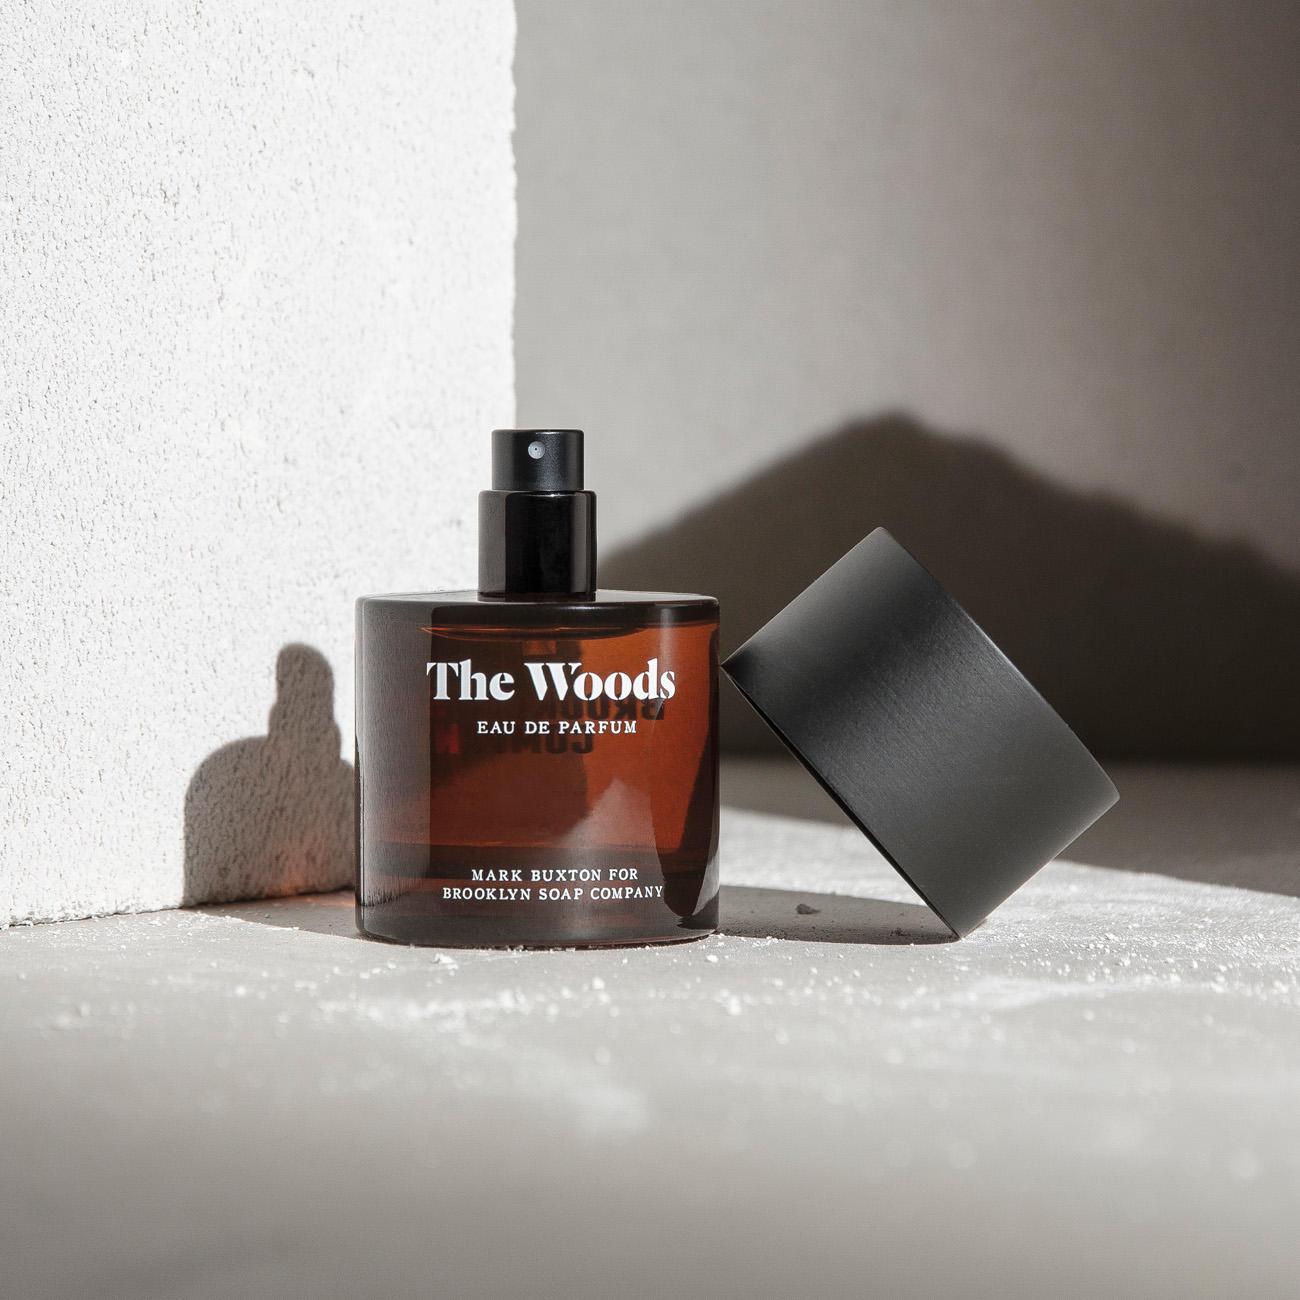 the woods eau de parfum mode klassiker entdecken. Black Bedroom Furniture Sets. Home Design Ideas